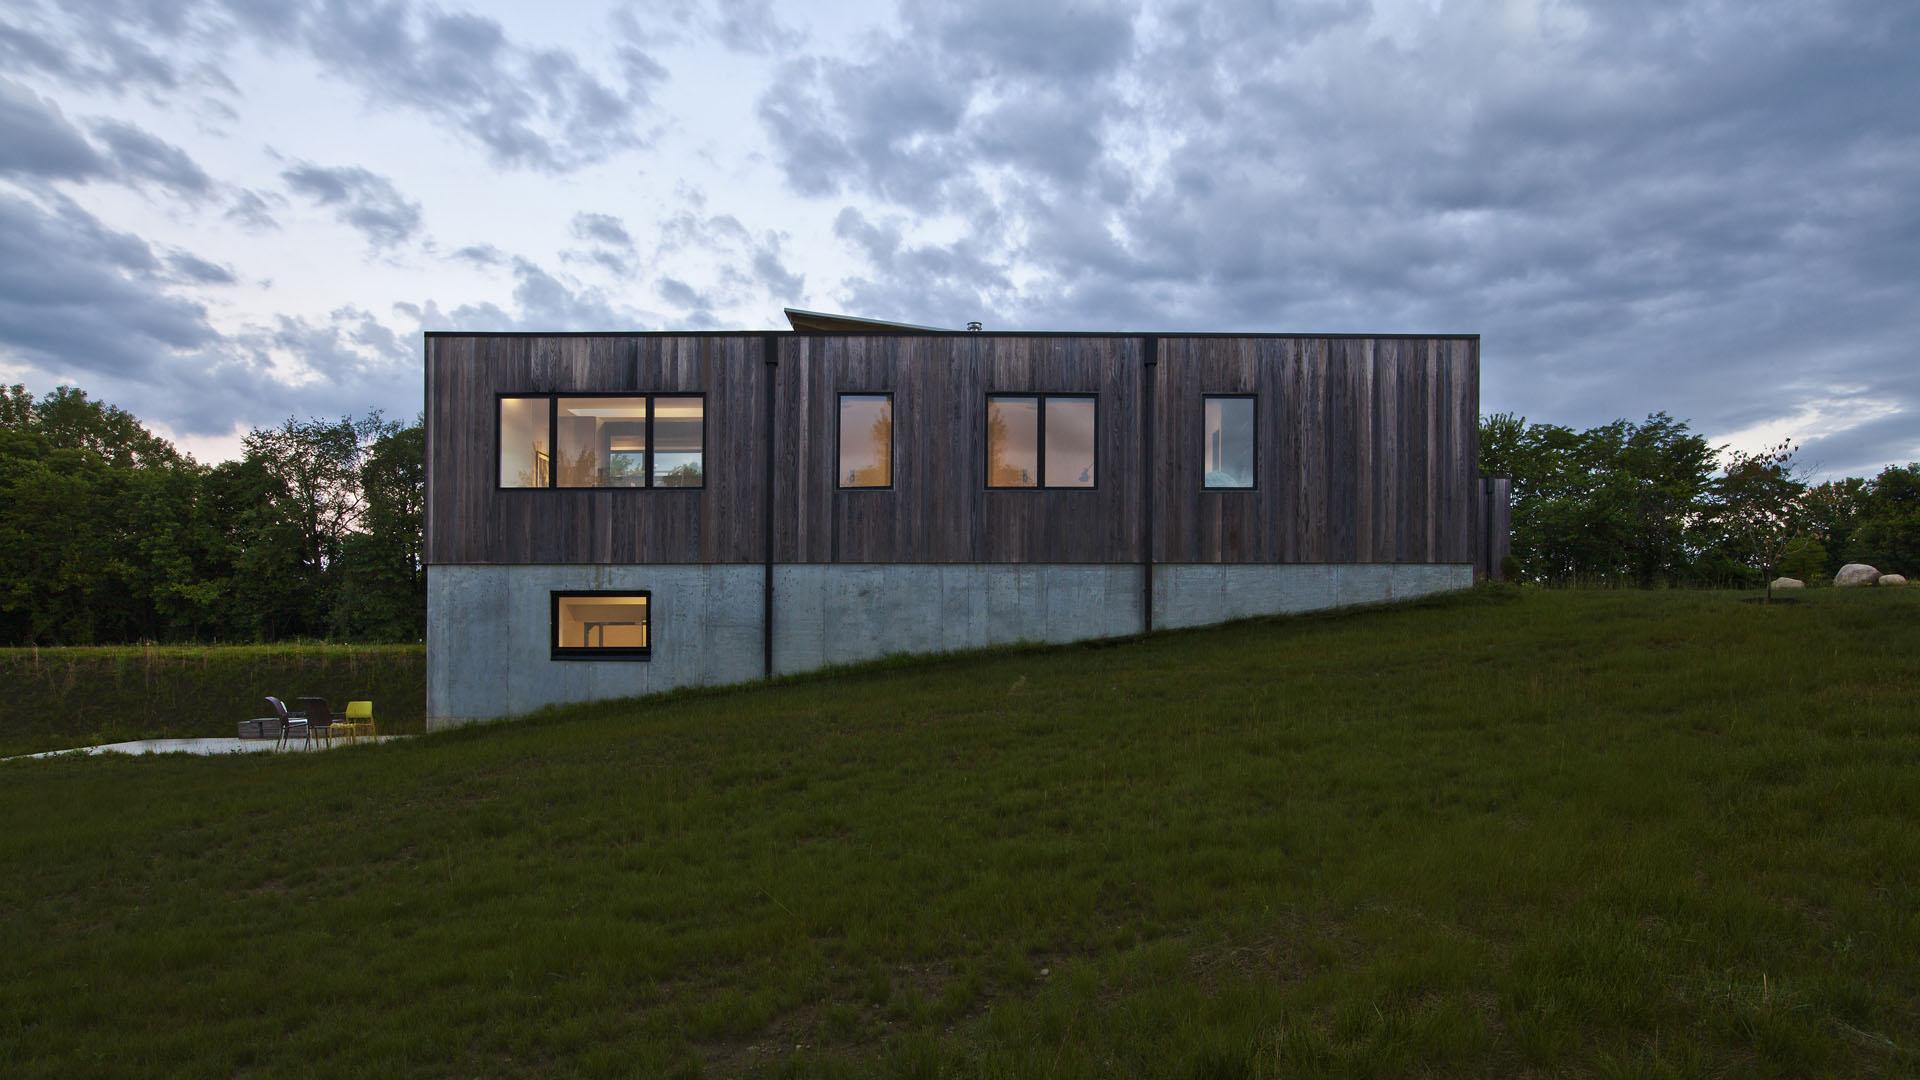 East Exterior Elevation (dawn) - Dezeen Magazine Features WERK Project - New Modern House 1 (Copperwood) - Zionsville, IN